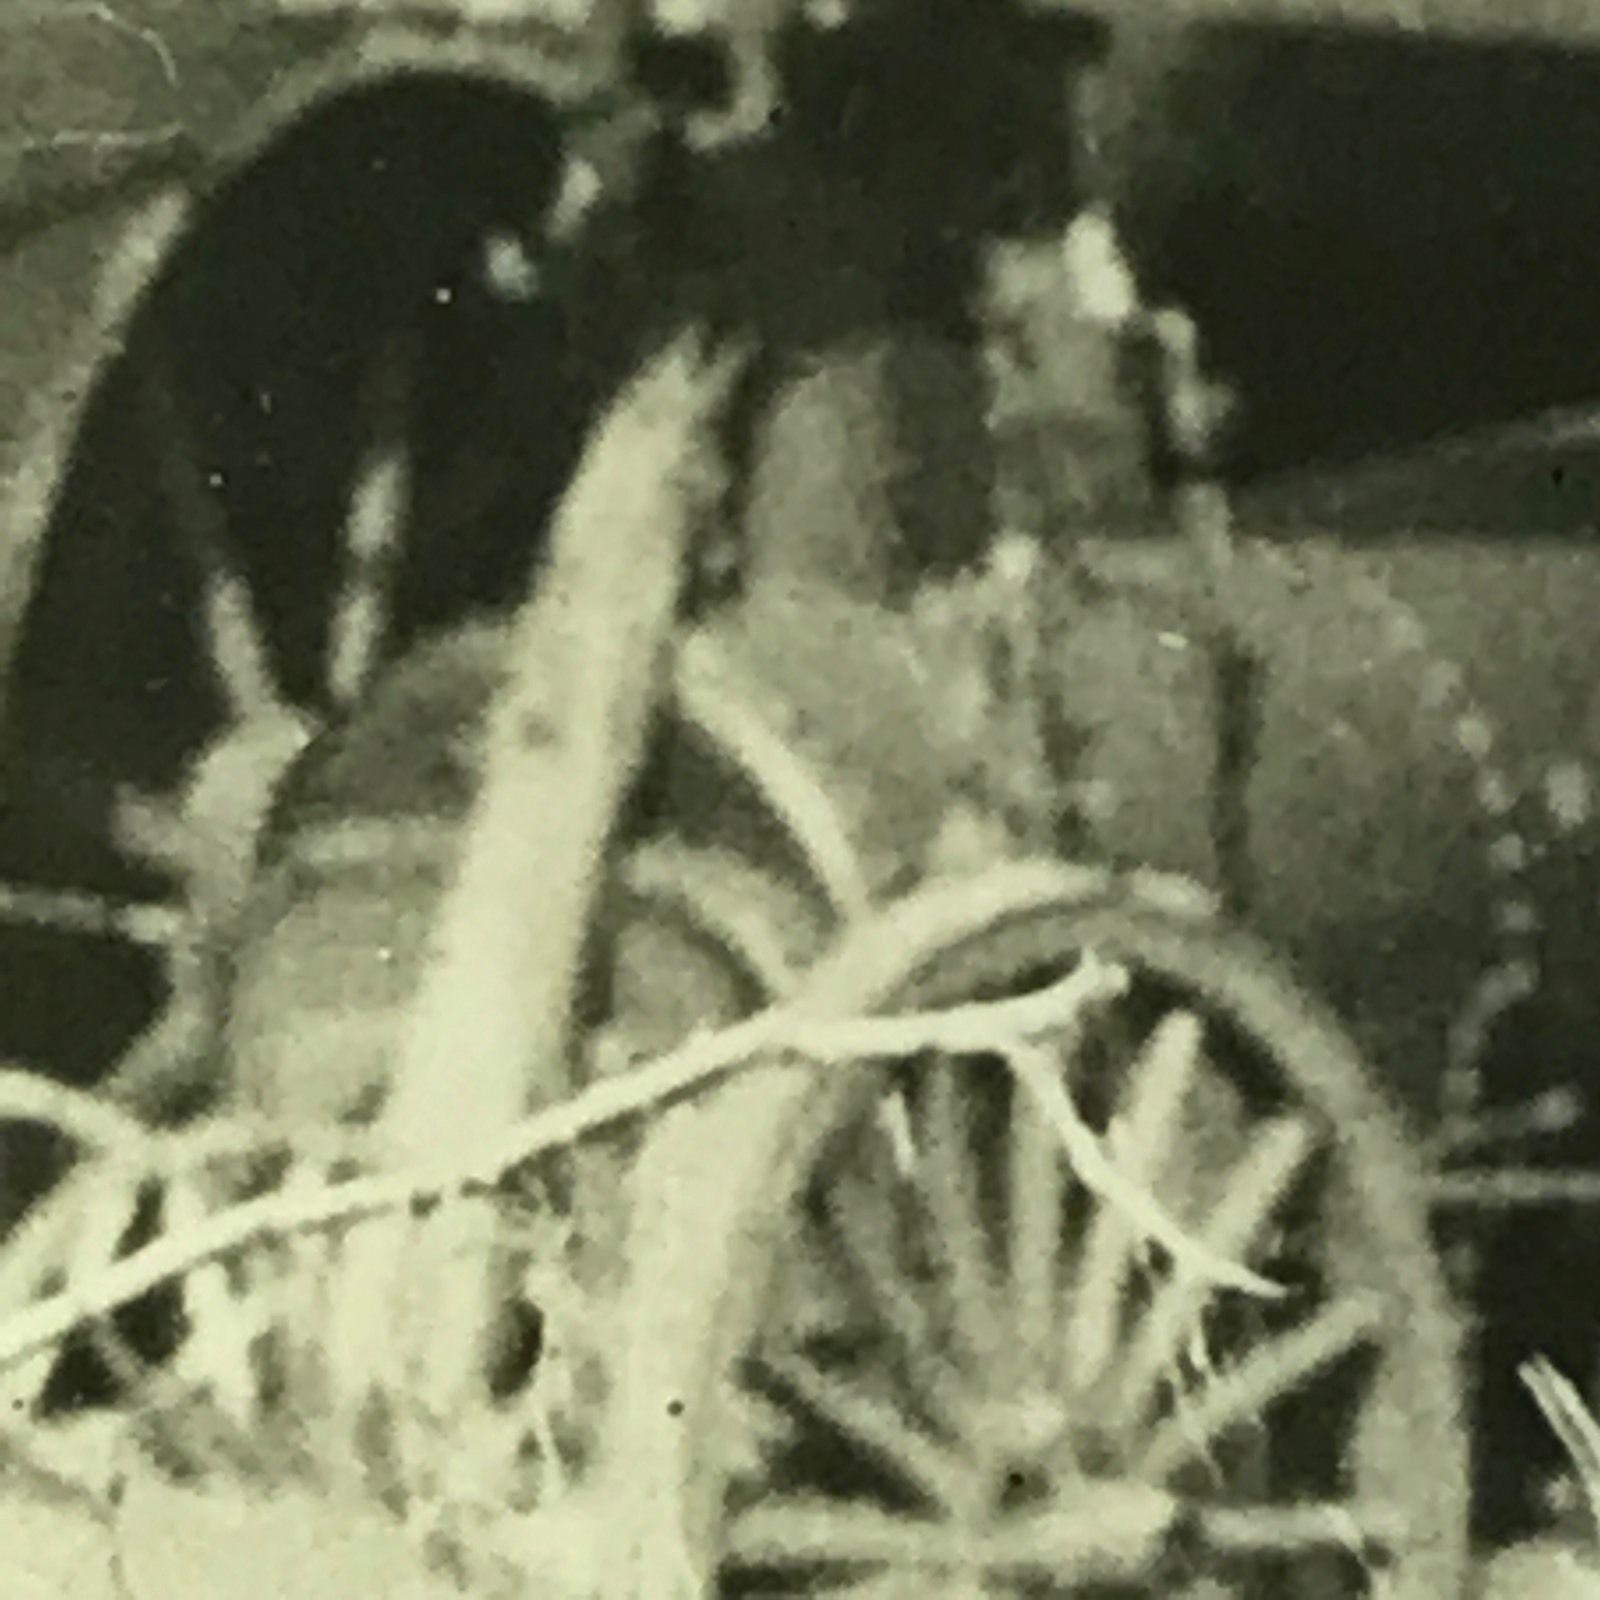 Vtg Magic Lantern Glass Slide Photo Barn Collapse On Farm Machines Tractor